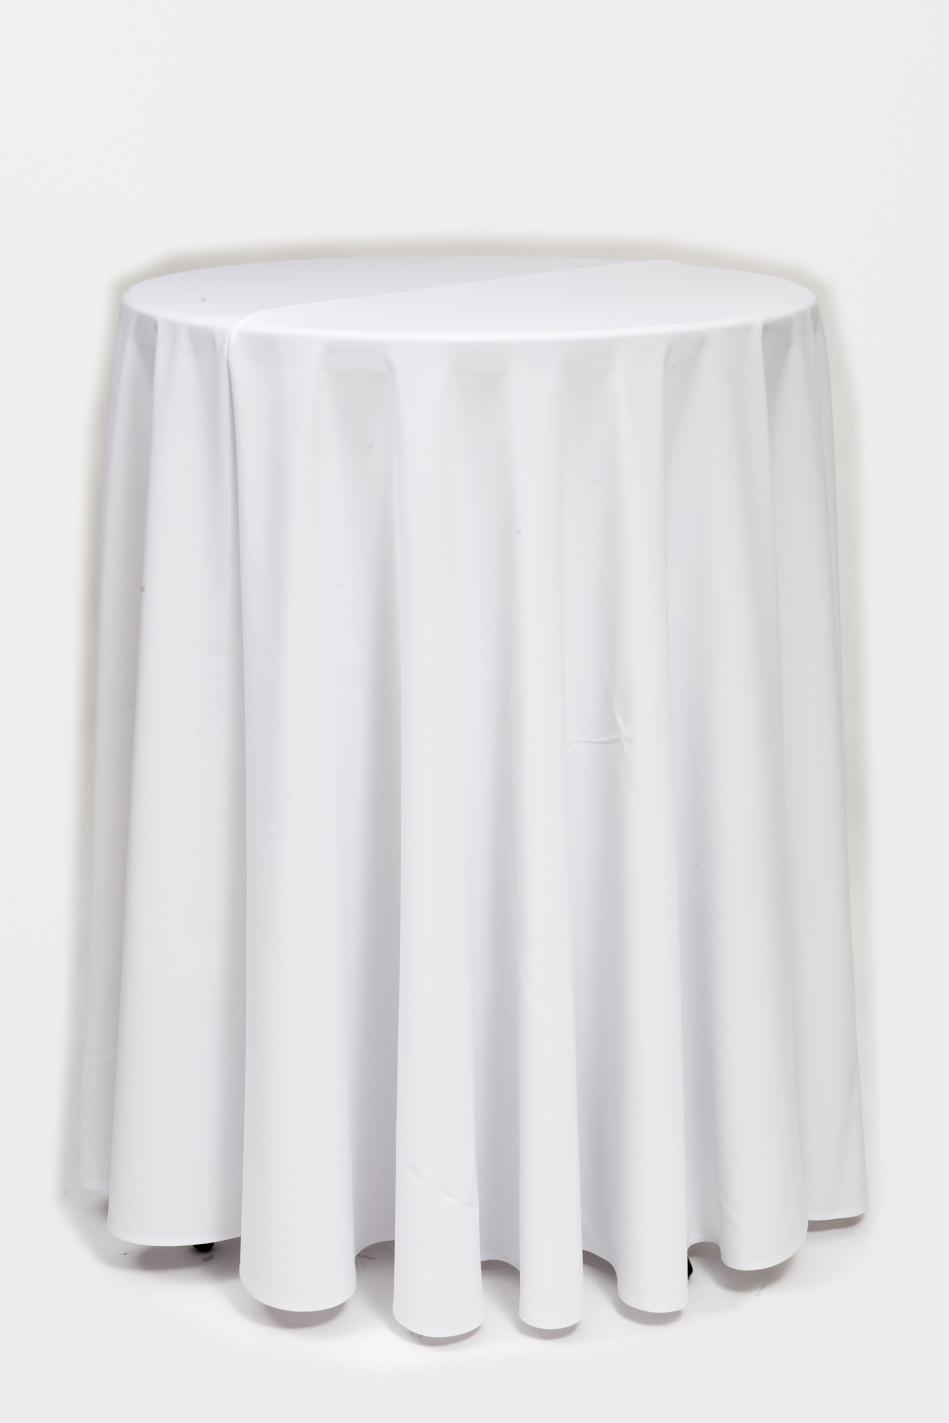 Staltiesė bistro stalui